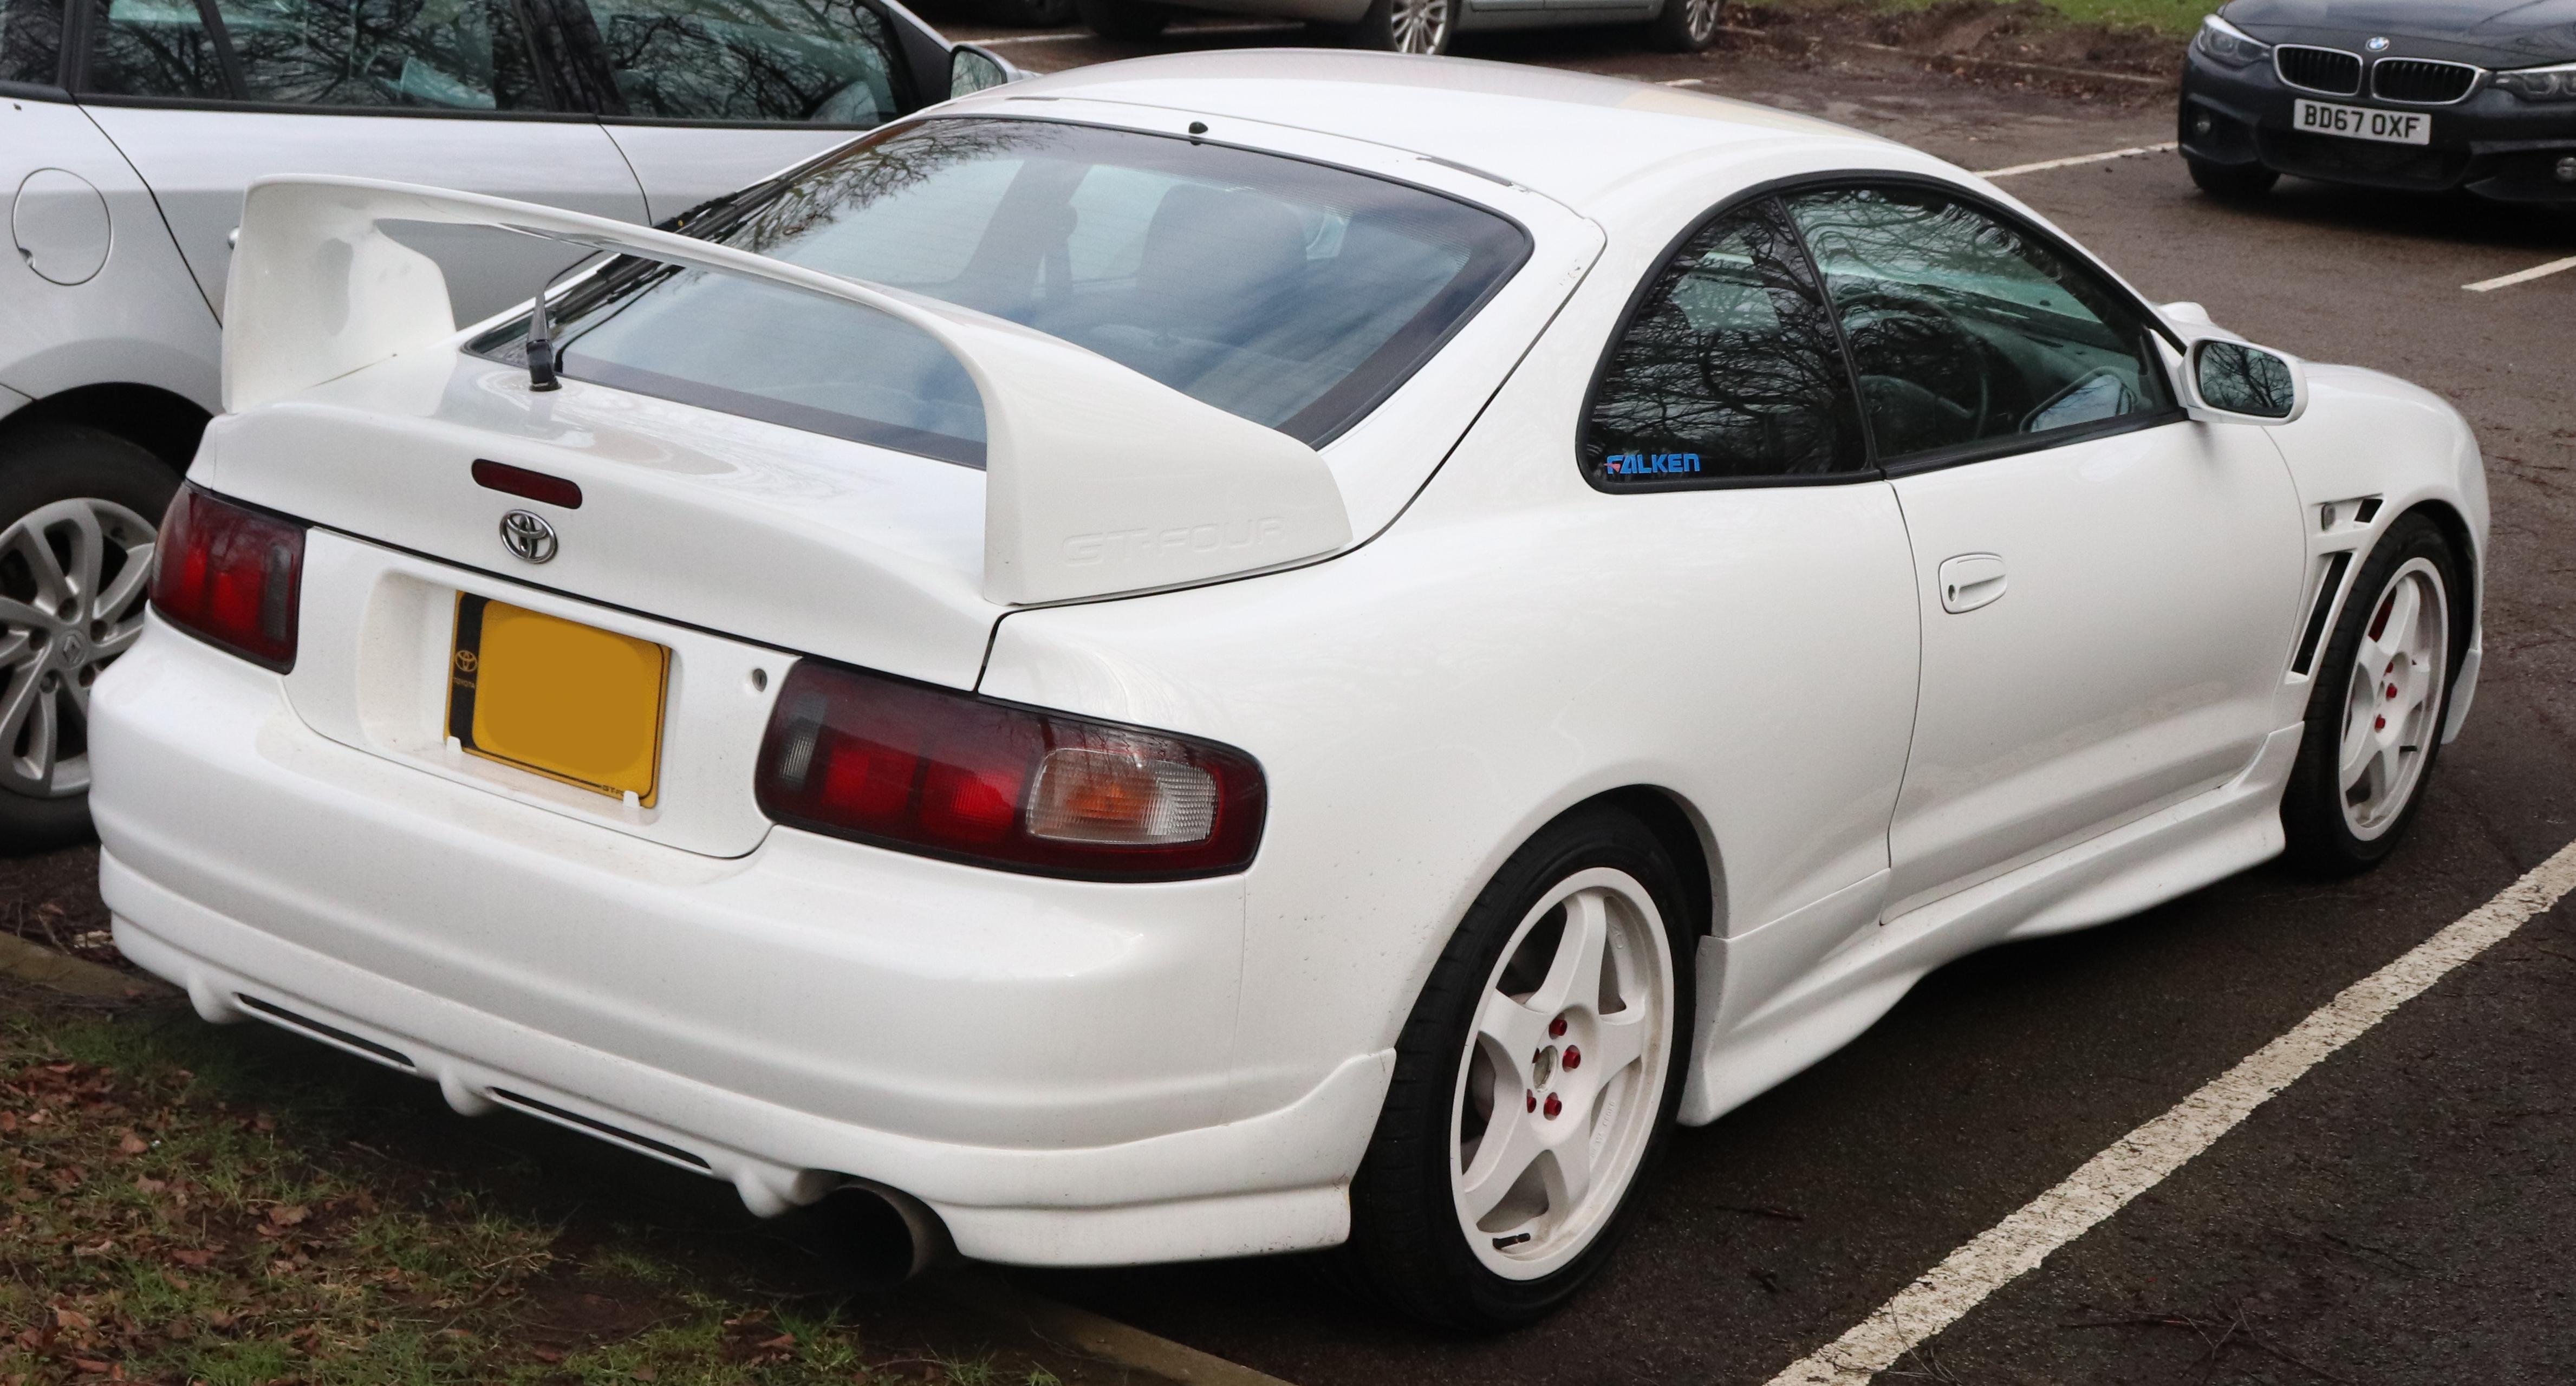 Kelebihan Kekurangan Toyota Celica 1997 Perbandingan Harga